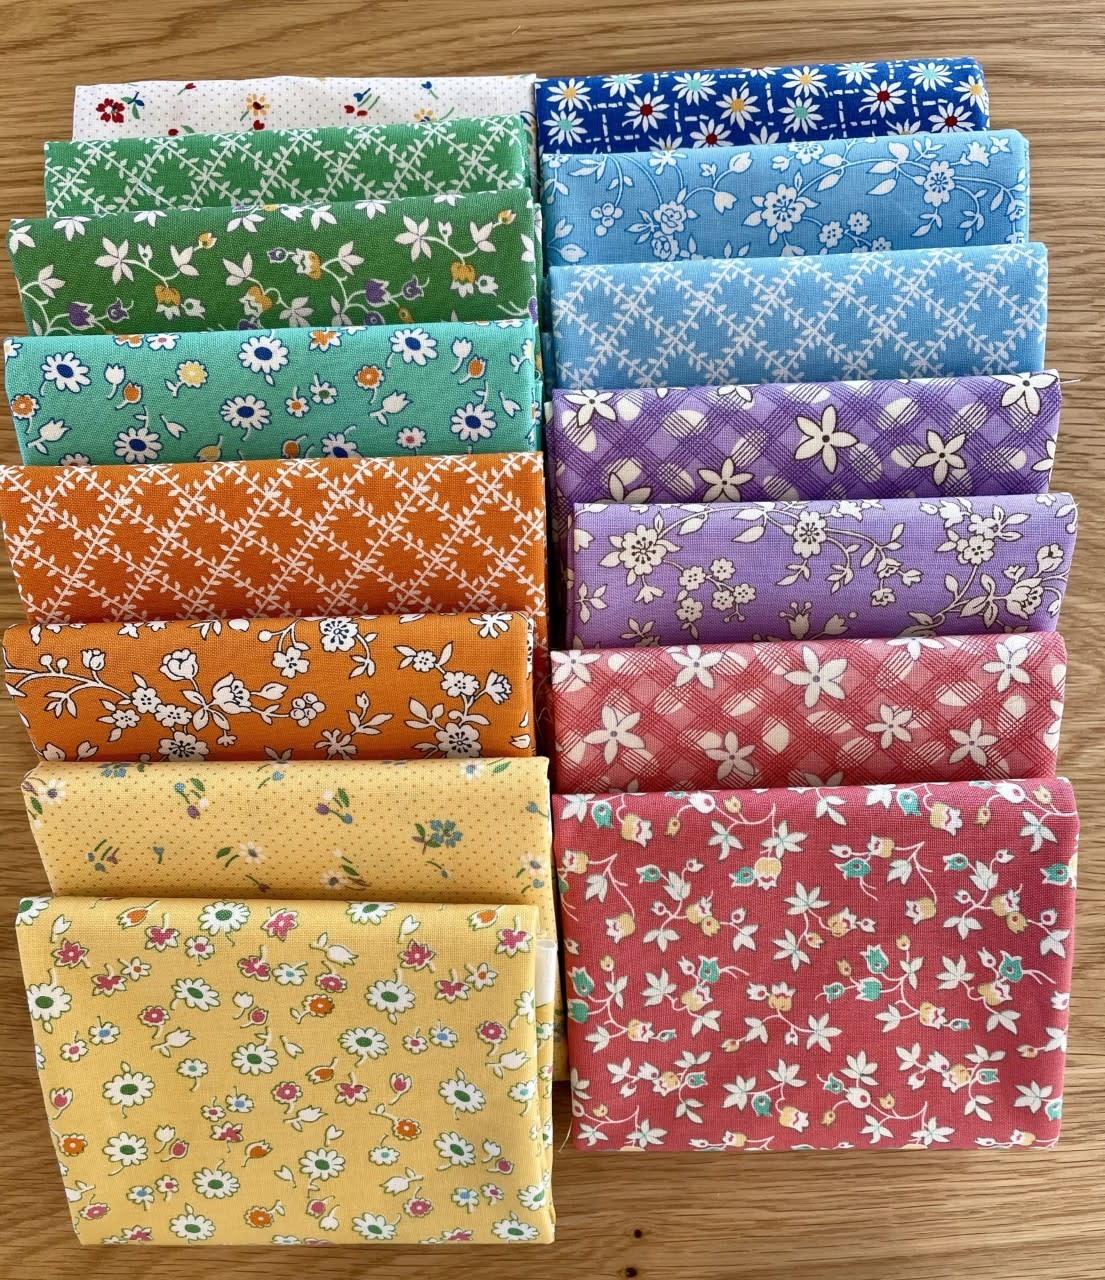 marcus fabrics Aunt Grace Bundel - 15 Fat Quarters